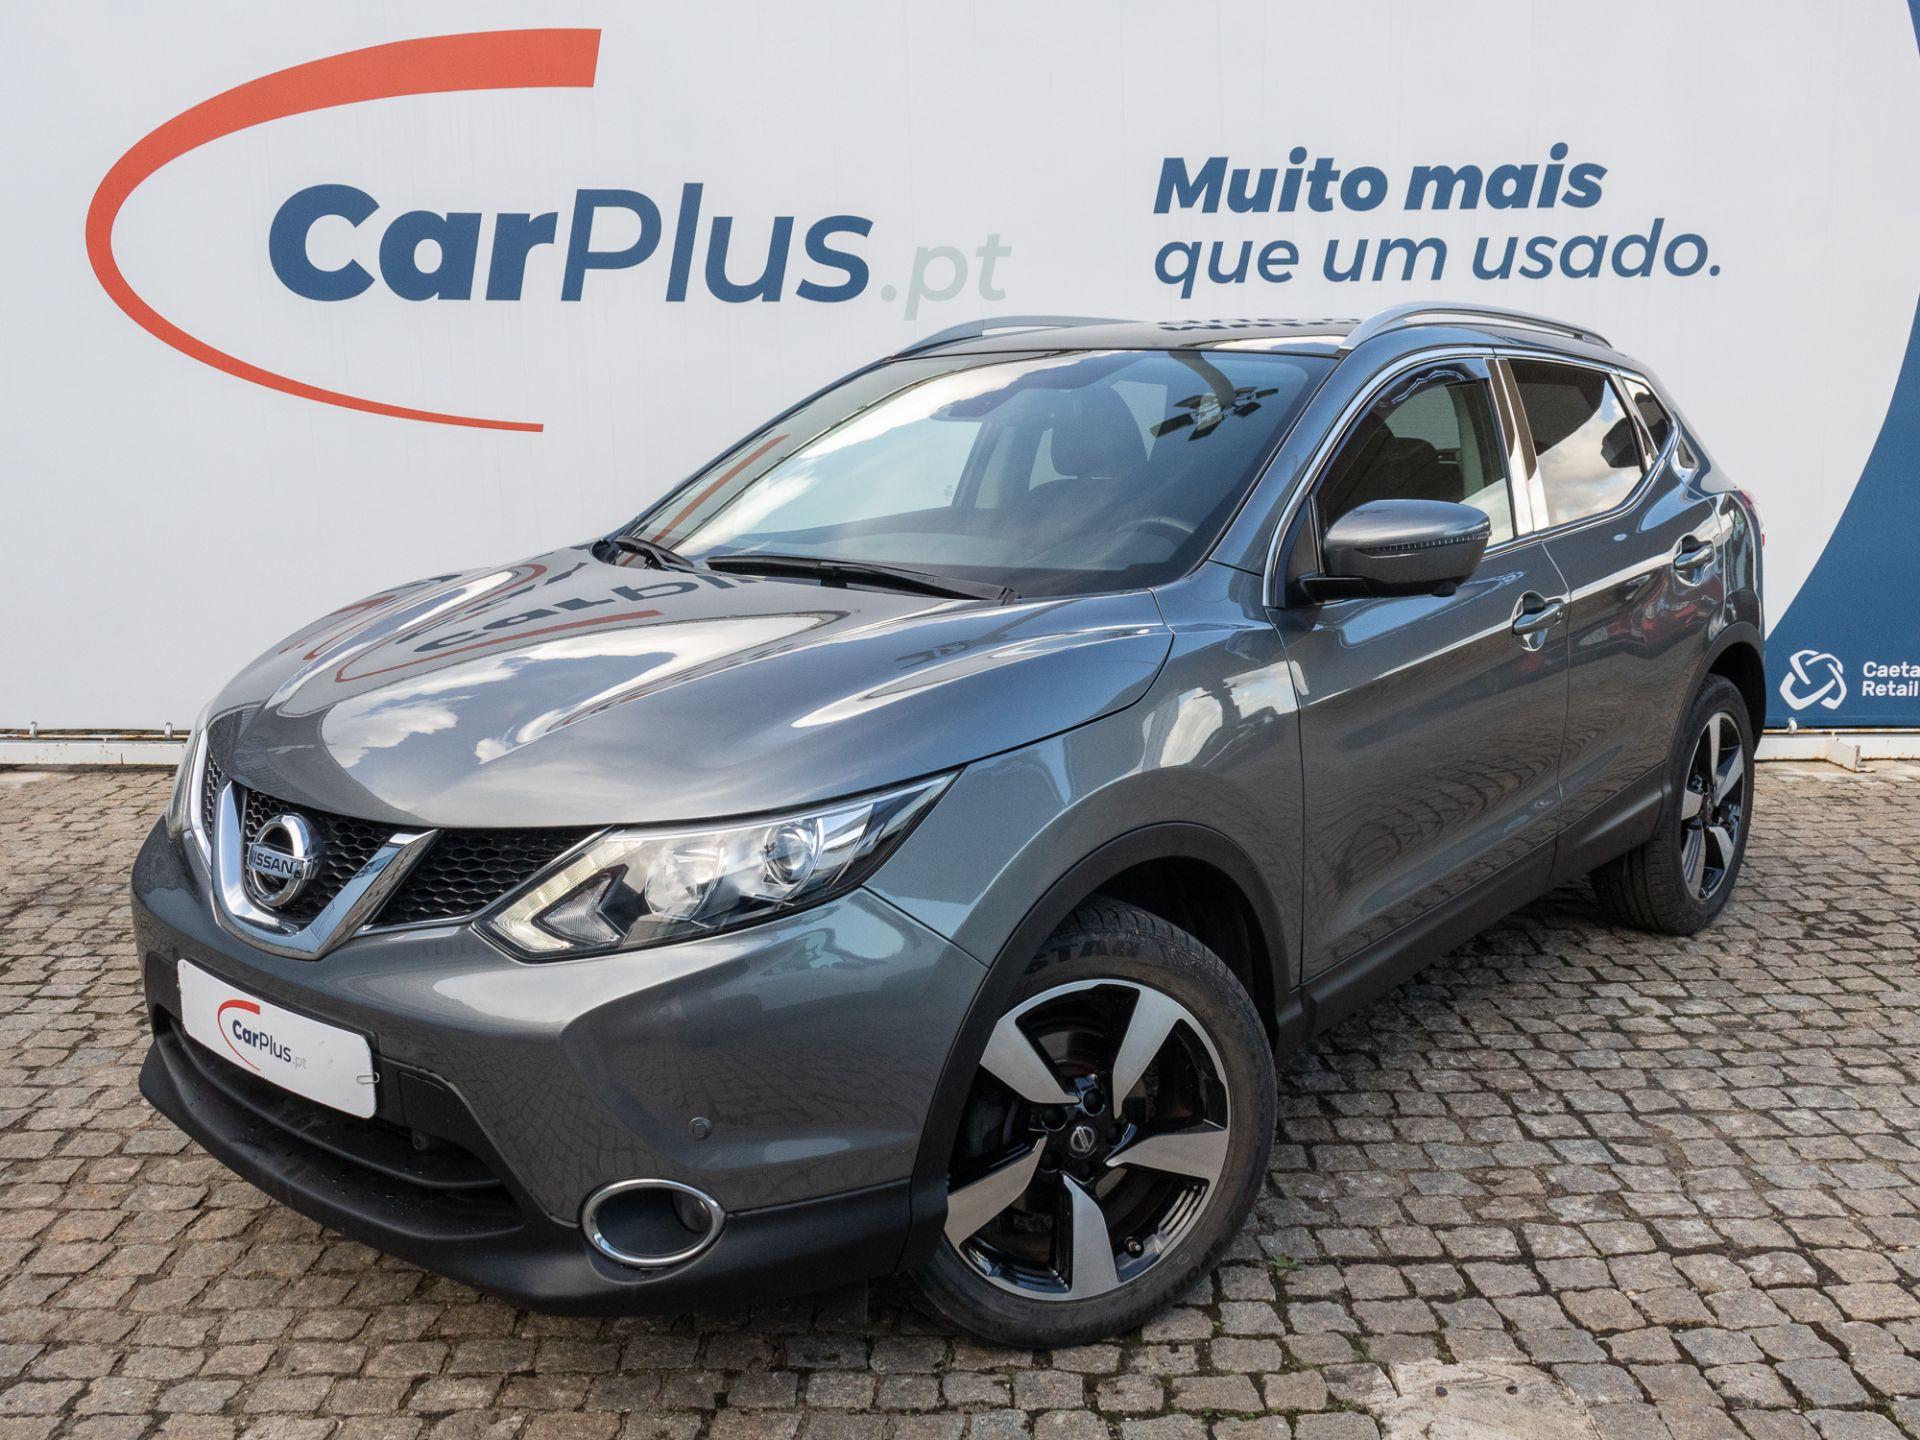 Nissan Qashqai 1.5 dCi N-Connecta 18 segunda mão Lisboa